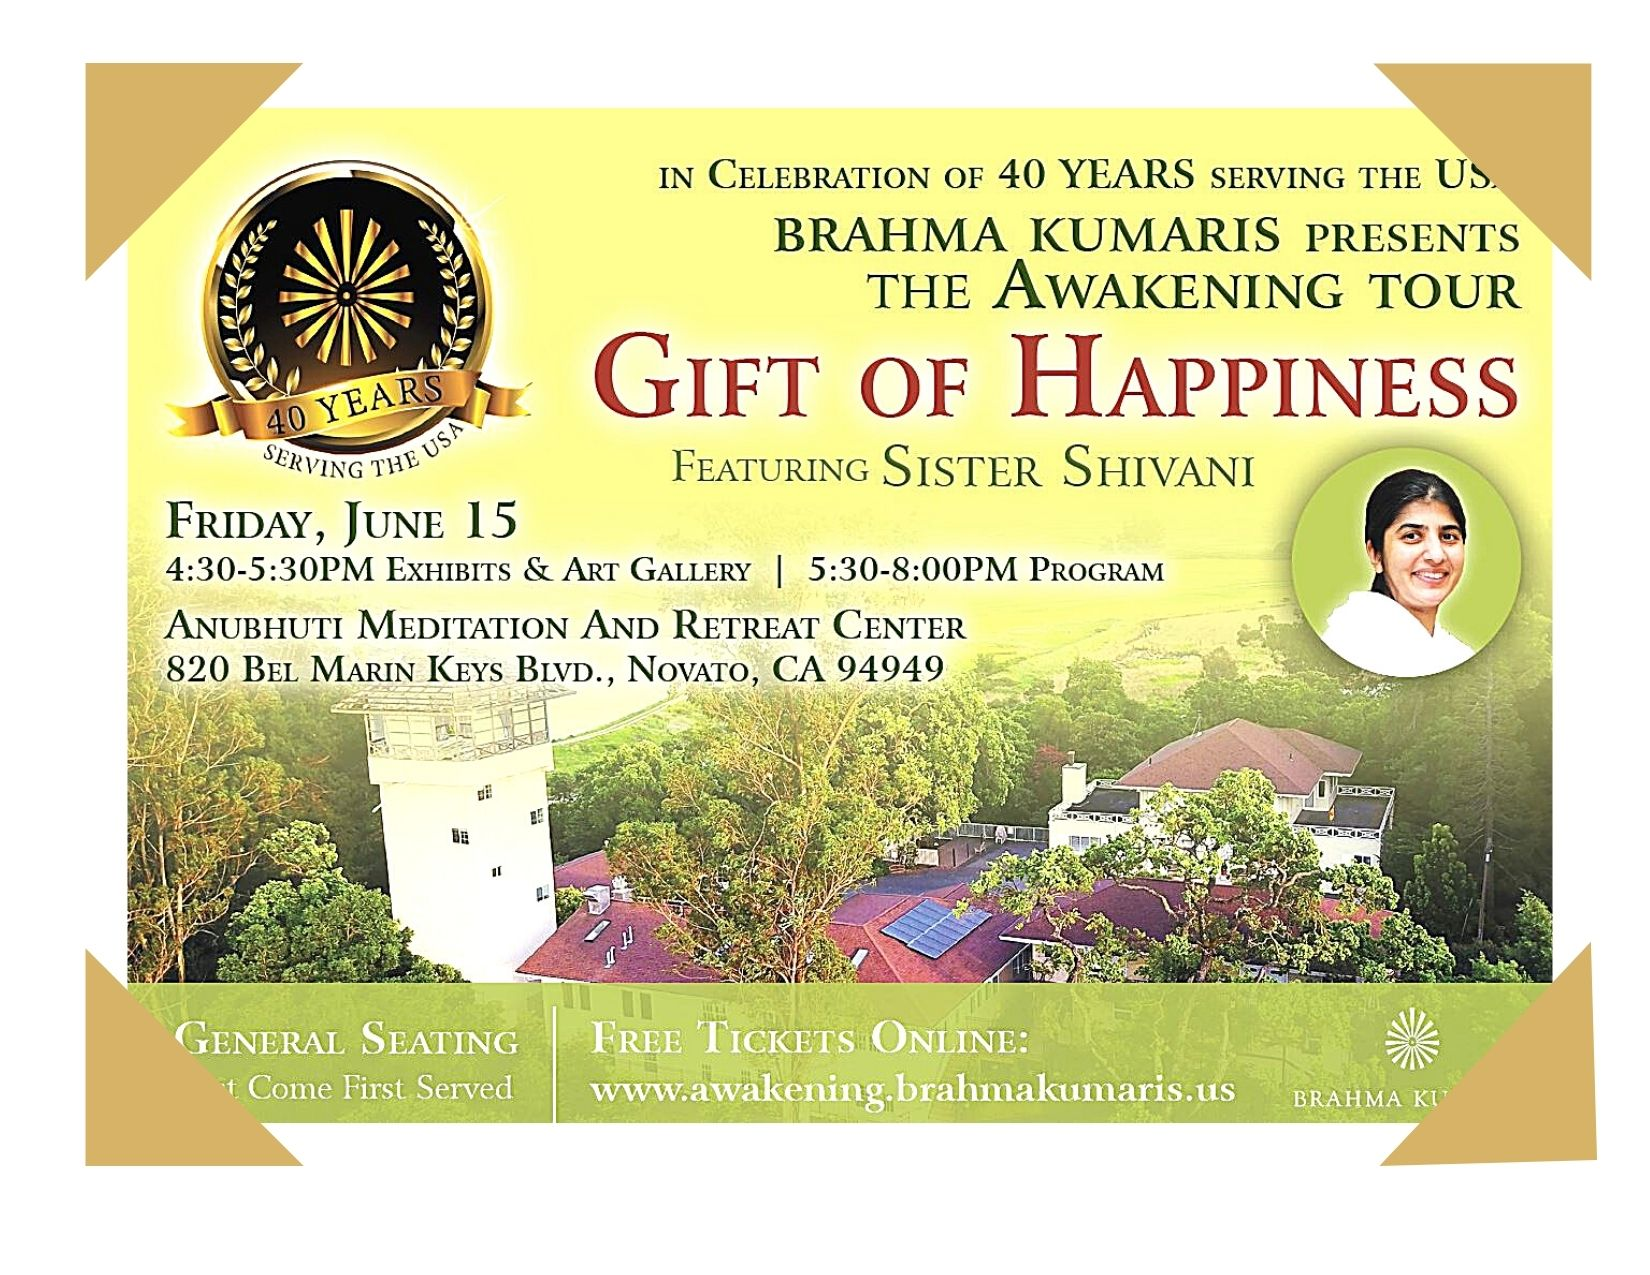 Celebrating 40 Years of Brahma Kumaris Service in USA